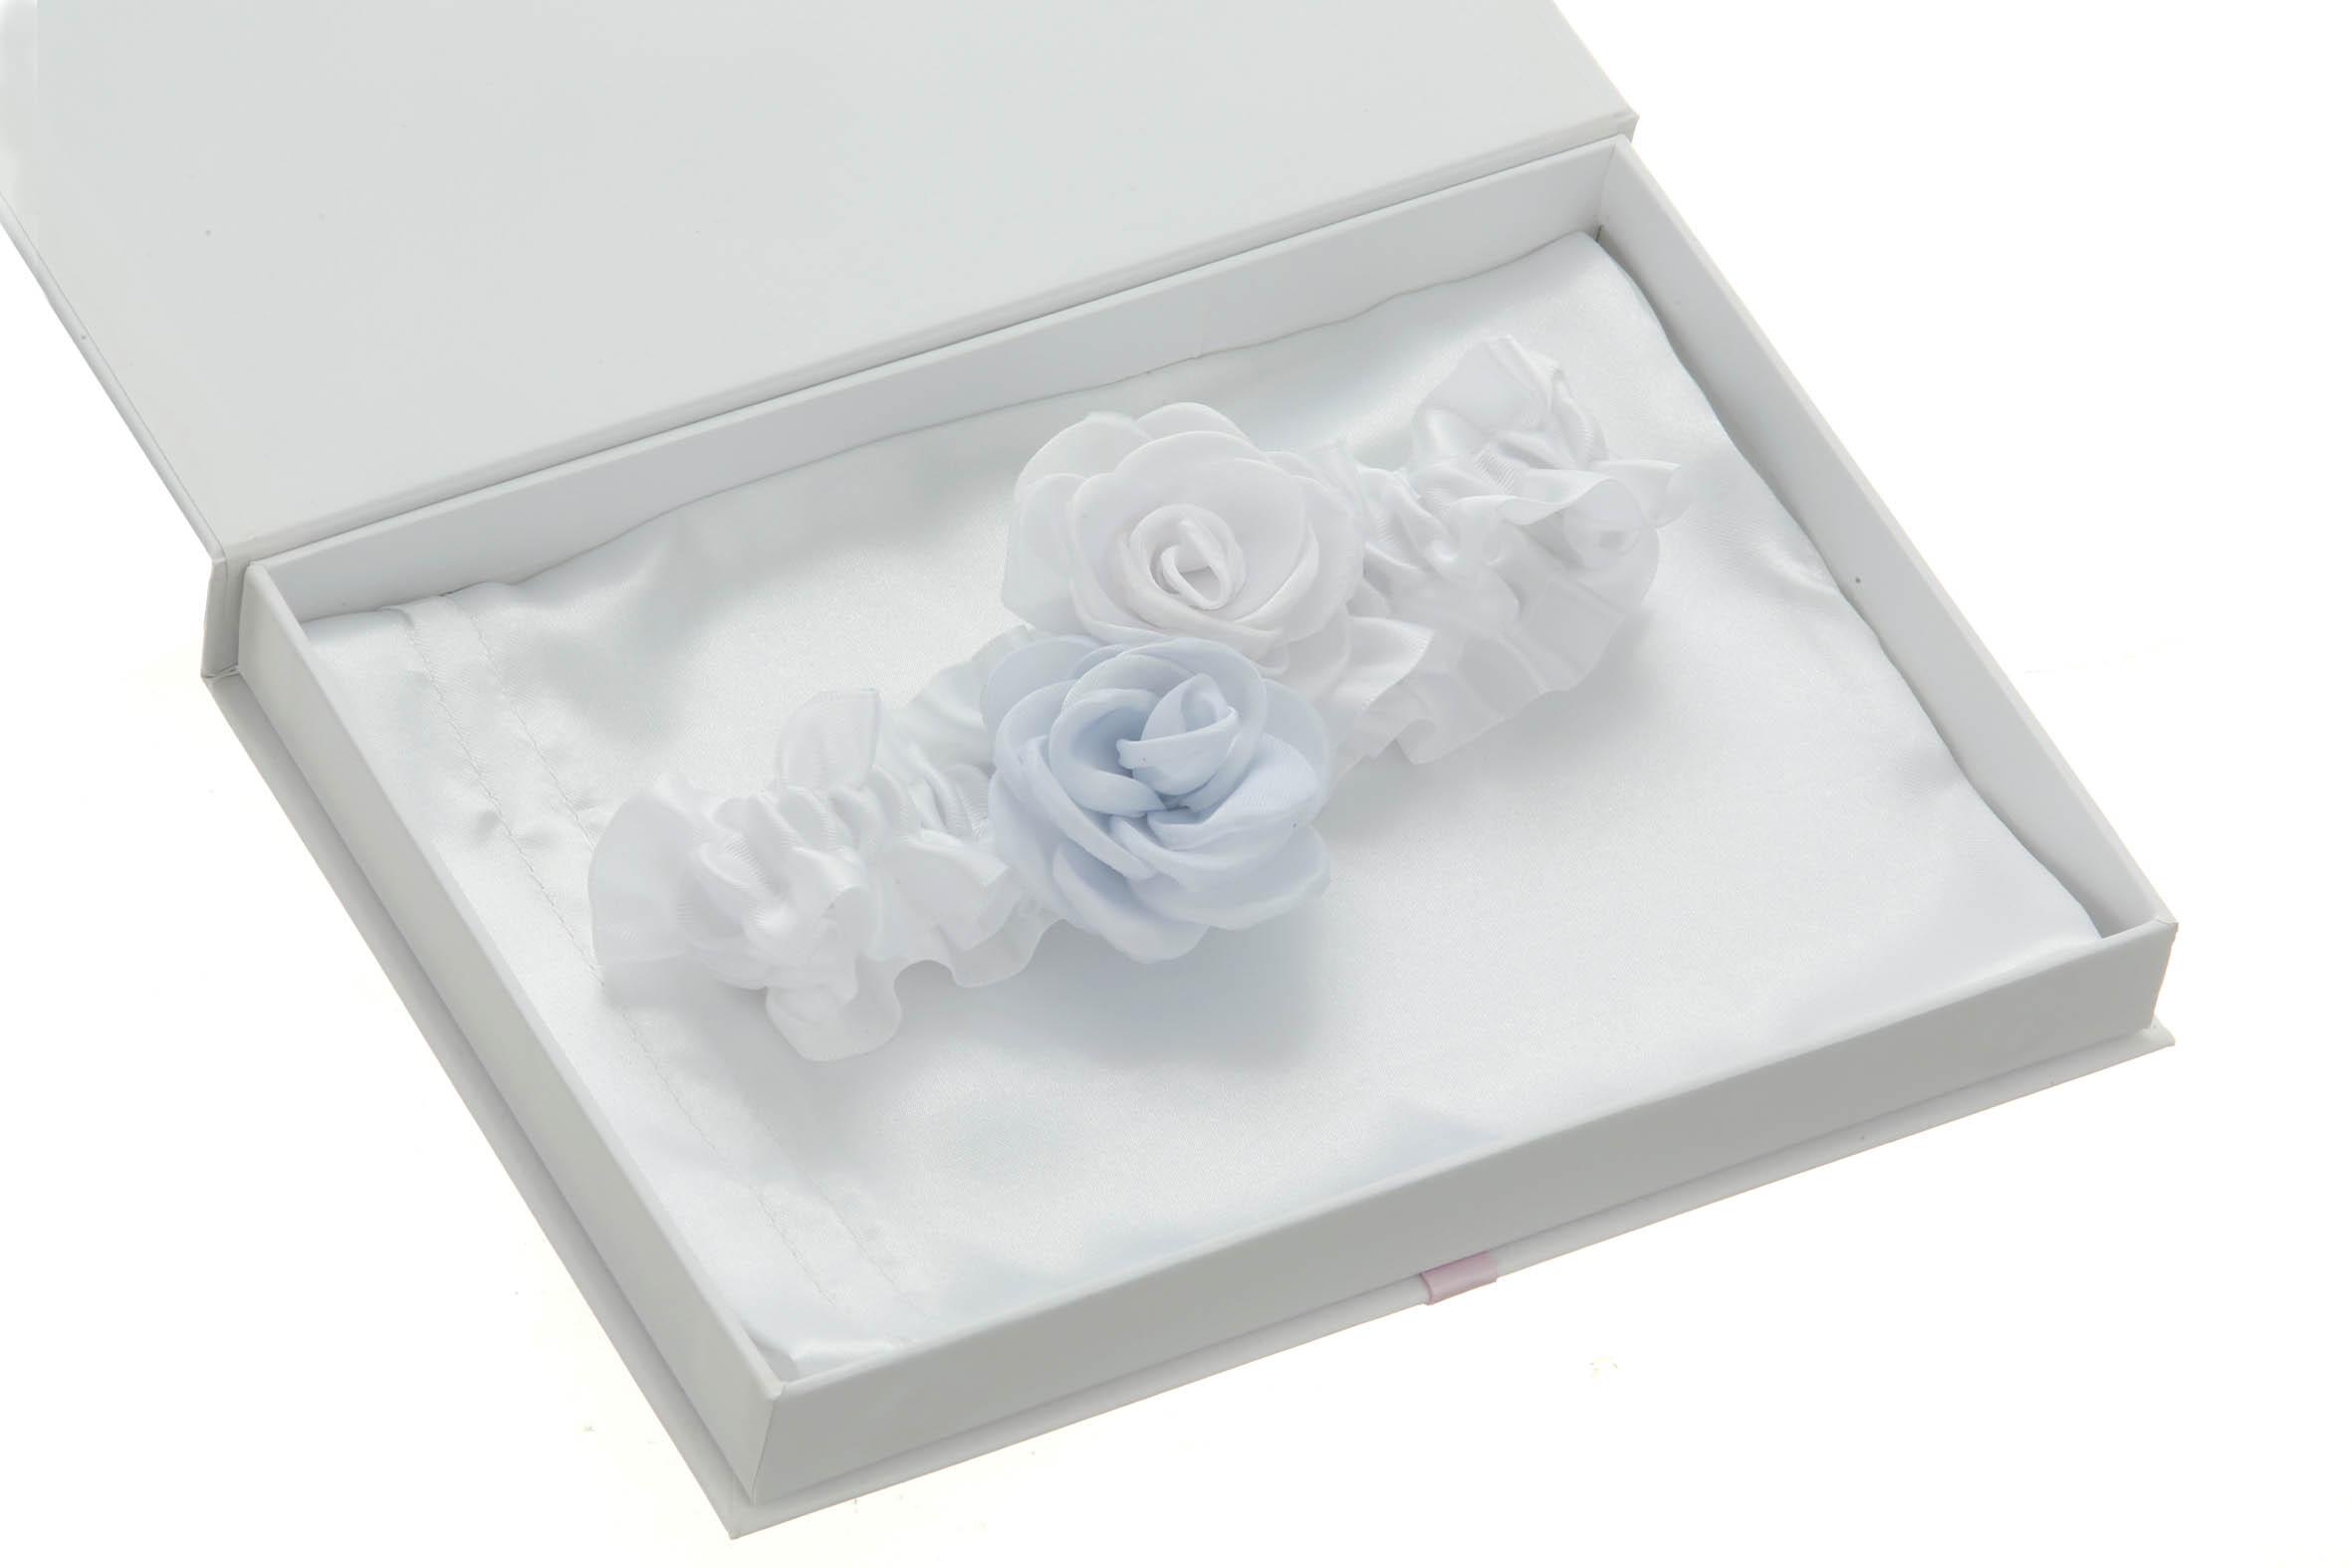 Blue and White Satin Rose Wedding Garter